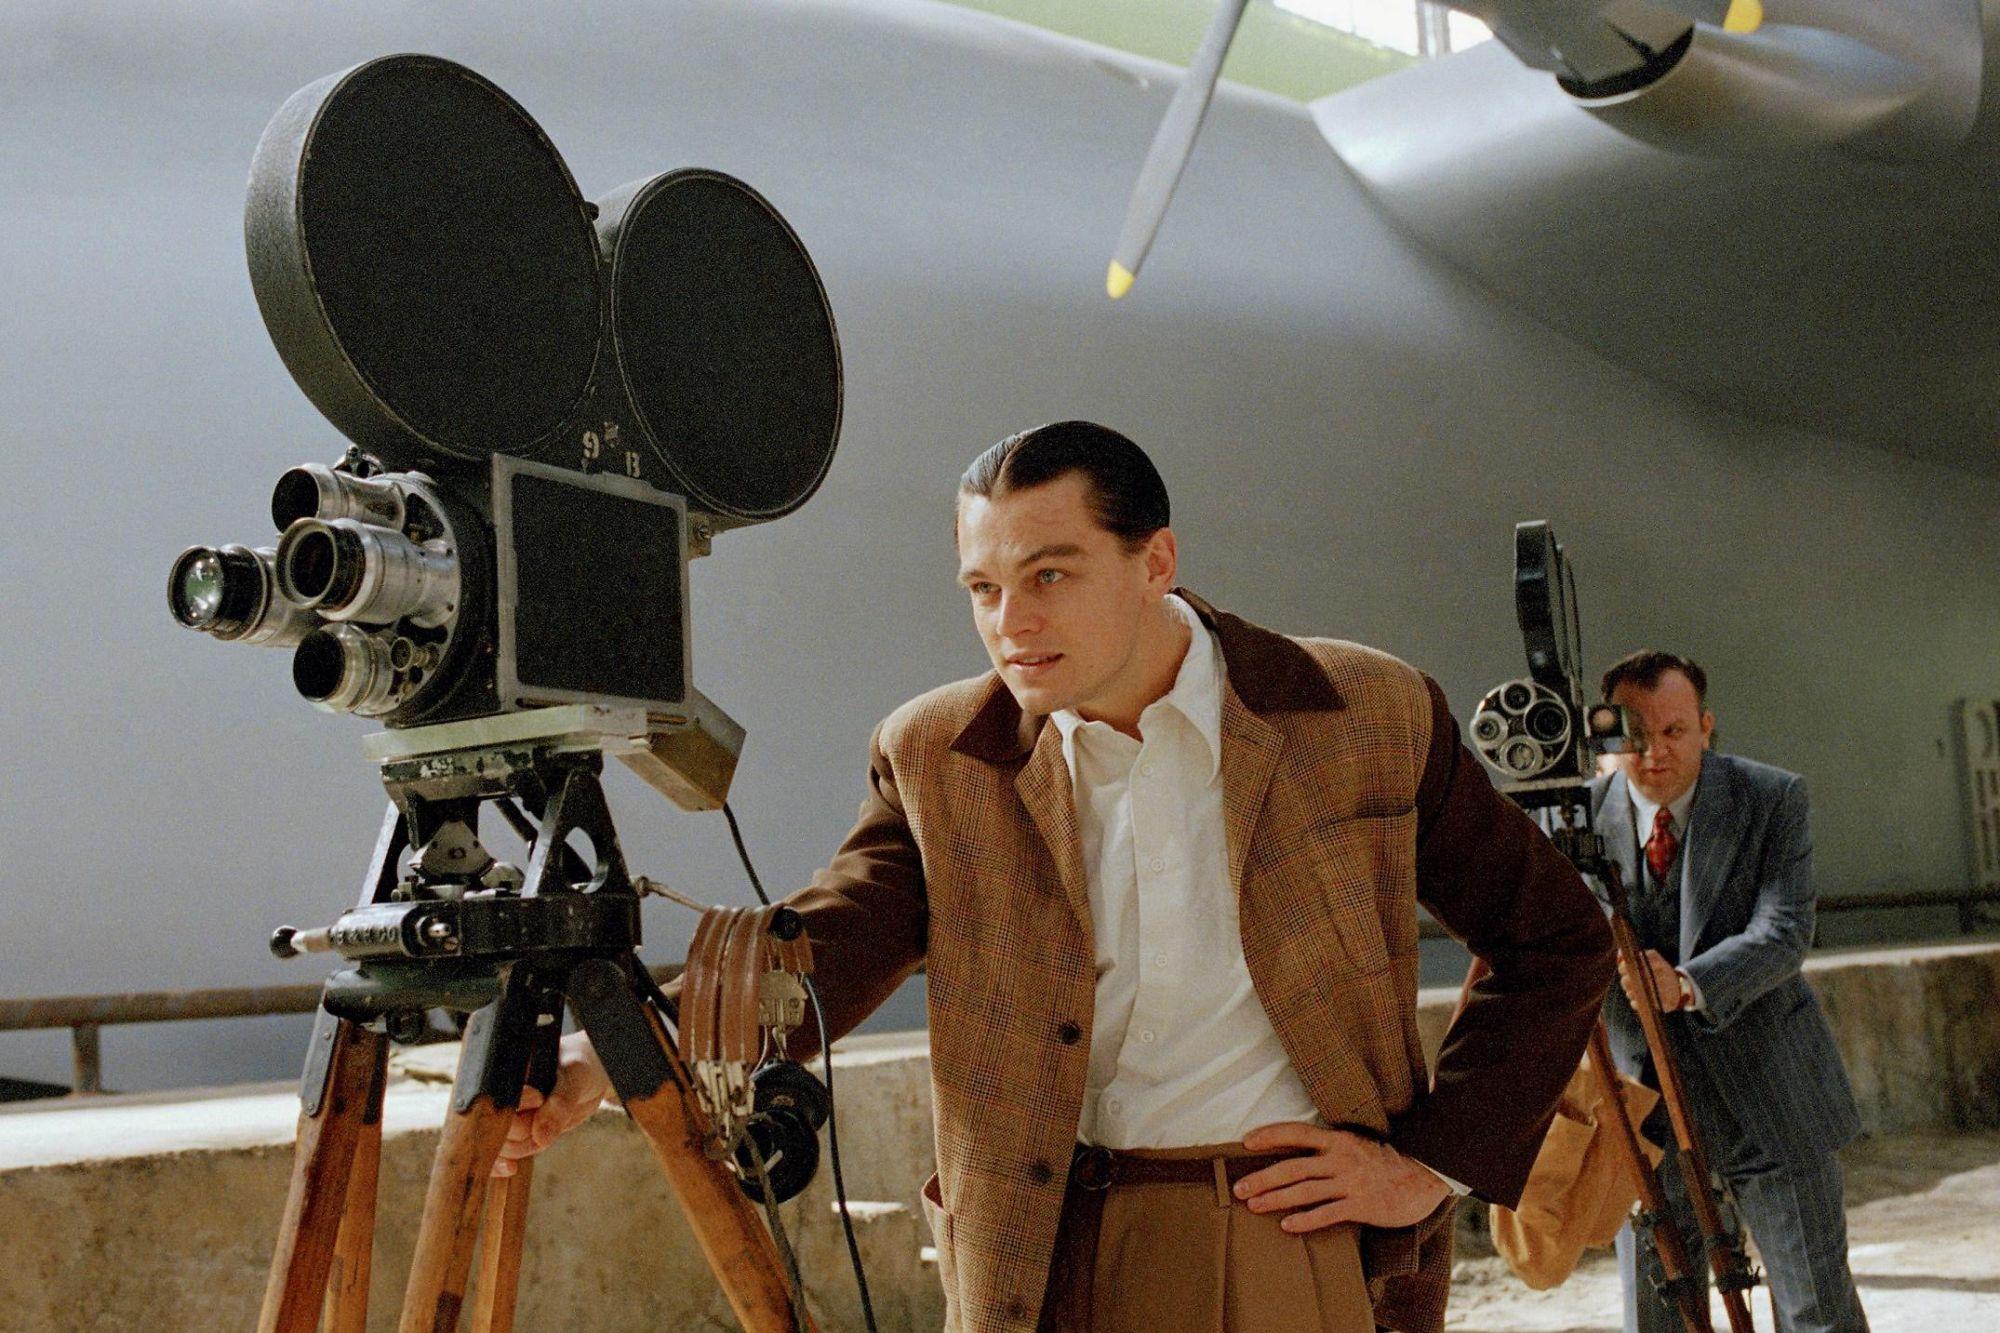 , 13 Must-Watch Movies for Aspiring Entrepreneurs, Saubio Making Wealth